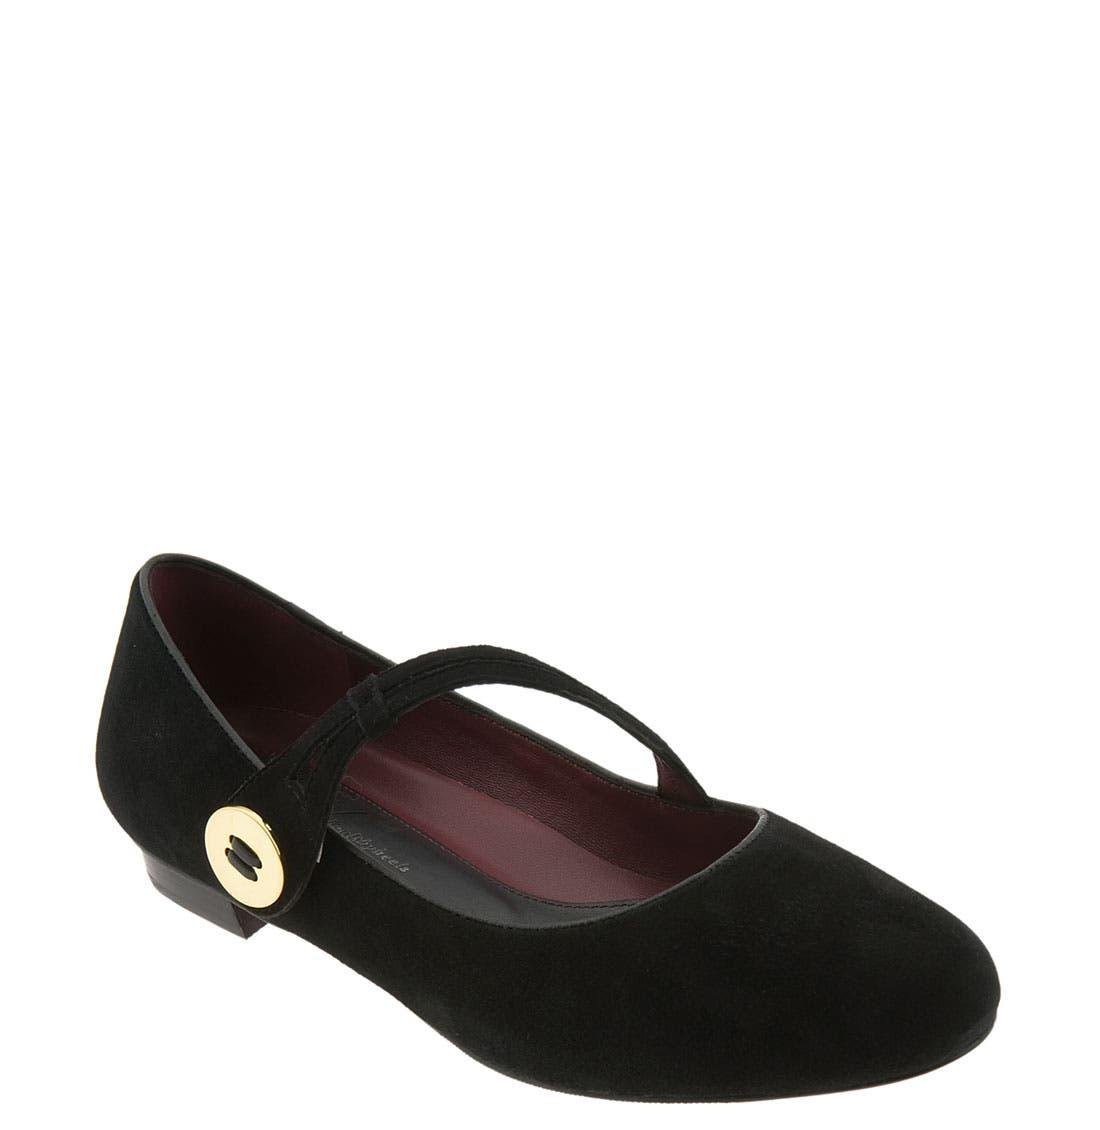 Alternate Image 1 Selected - Oh! Shoes 'Franka' Mary Jane Flat